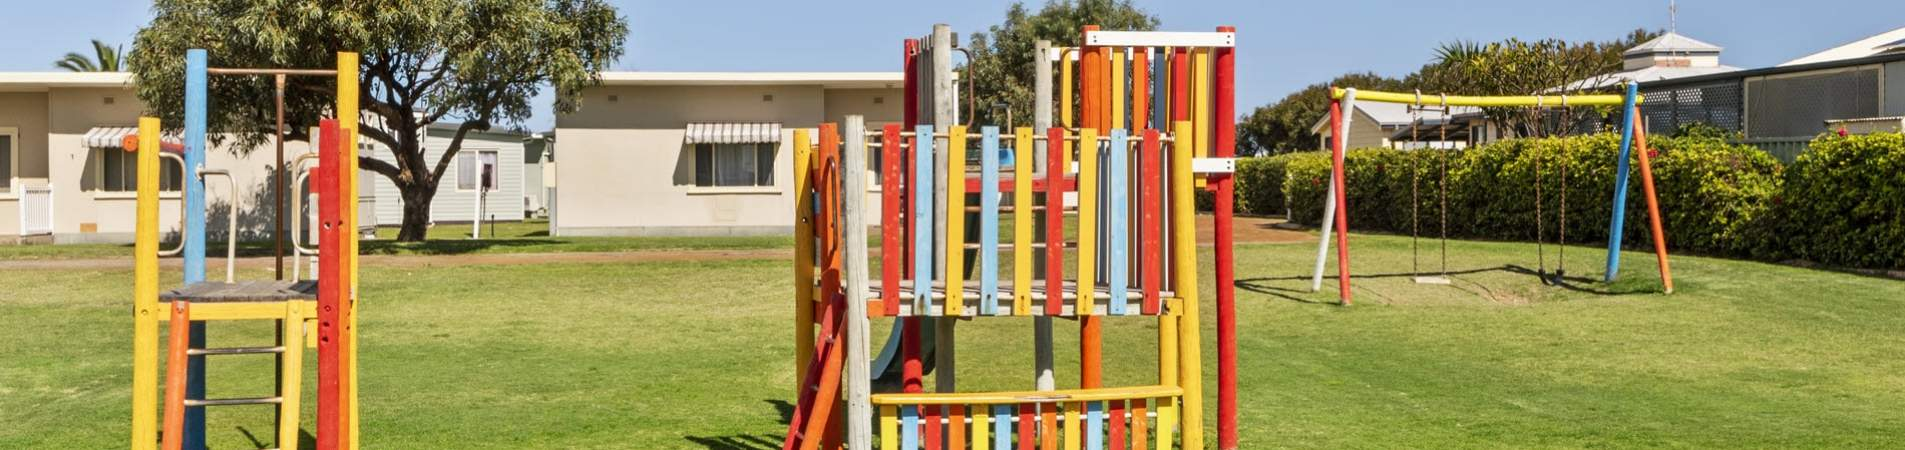 geraldton belair gardens caravan park facilities - banner 4